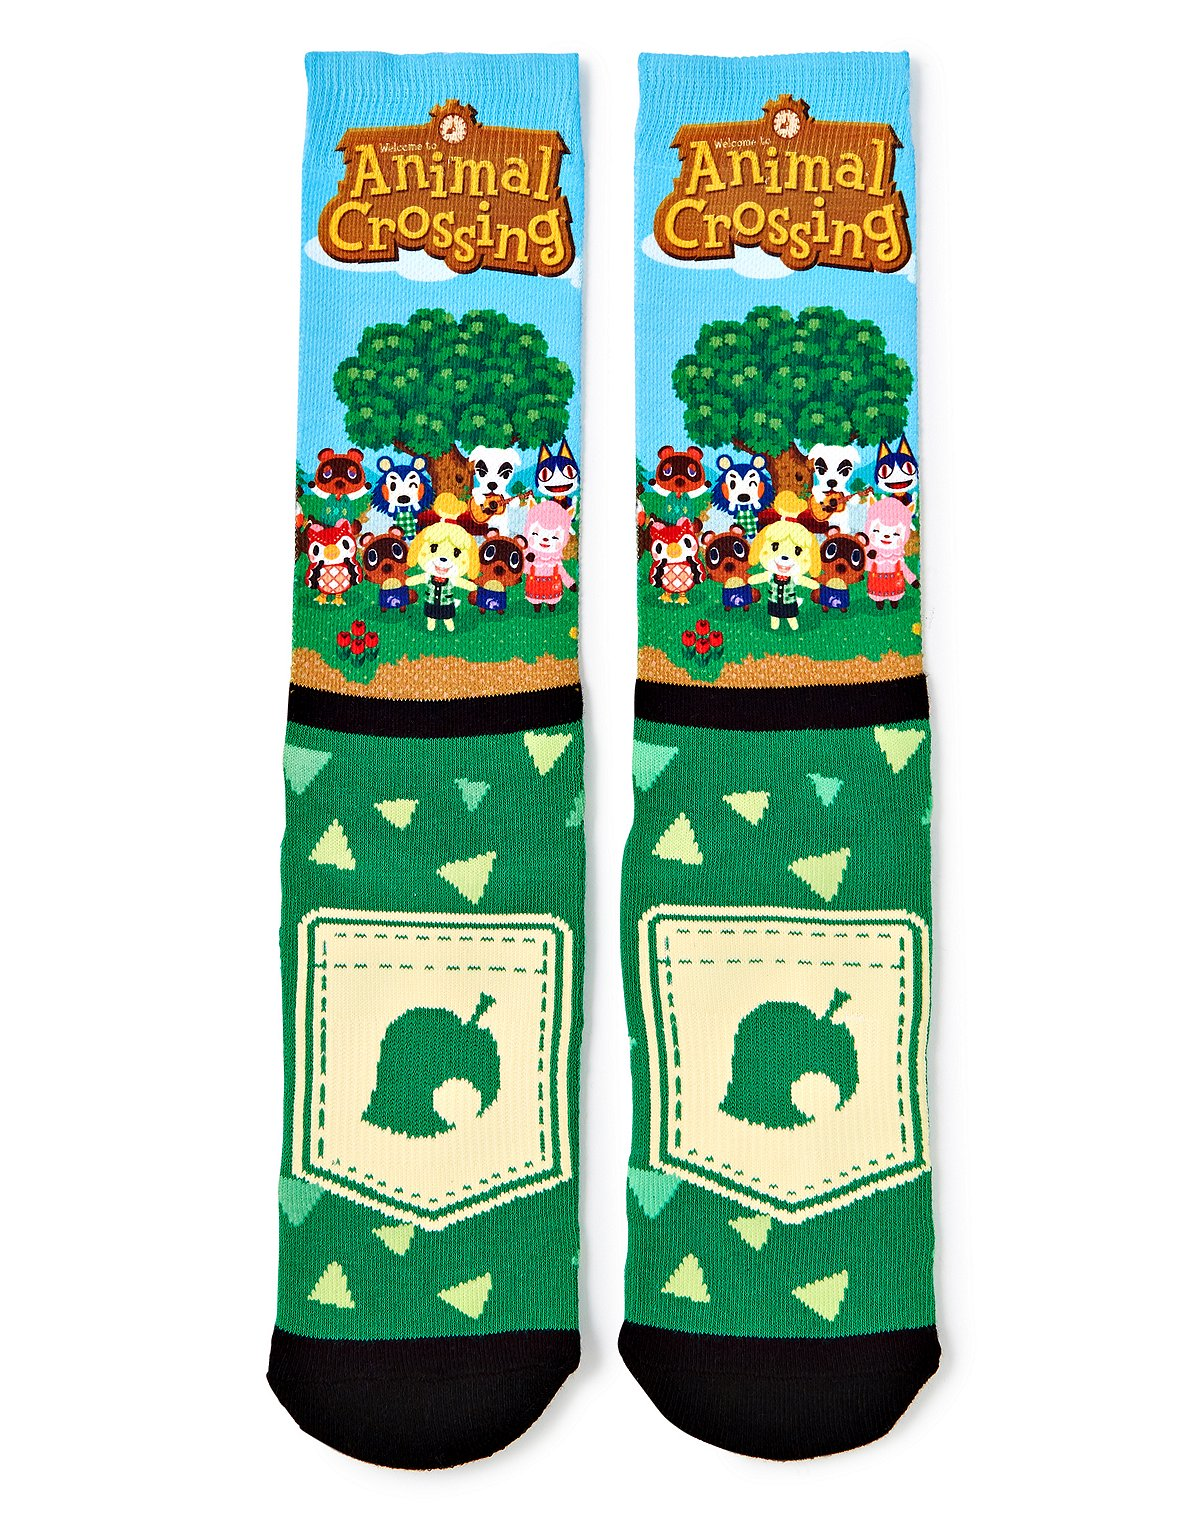 Animal Crossing Socks